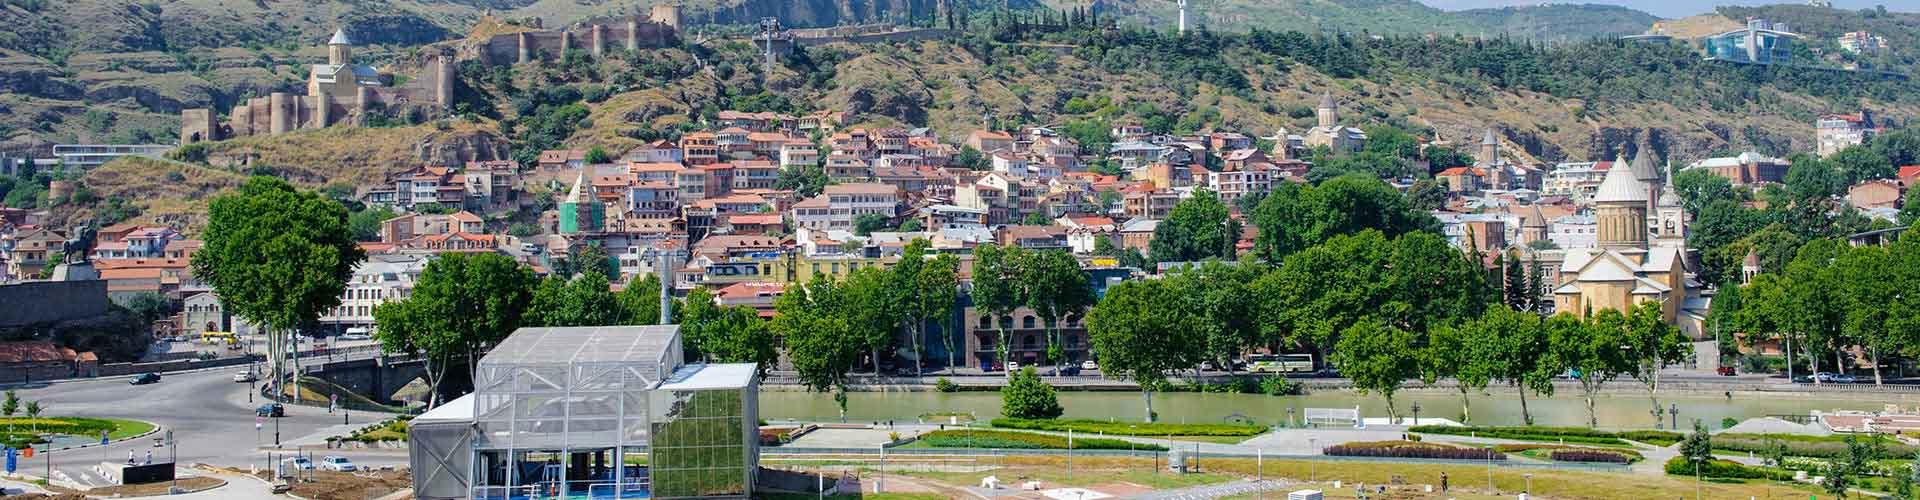 Tiflis - Jugendherbergen in Tiflis. Tiflis auf der Karte. Fotos und Bewertungen für jede Jugendherberge in Tiflis.